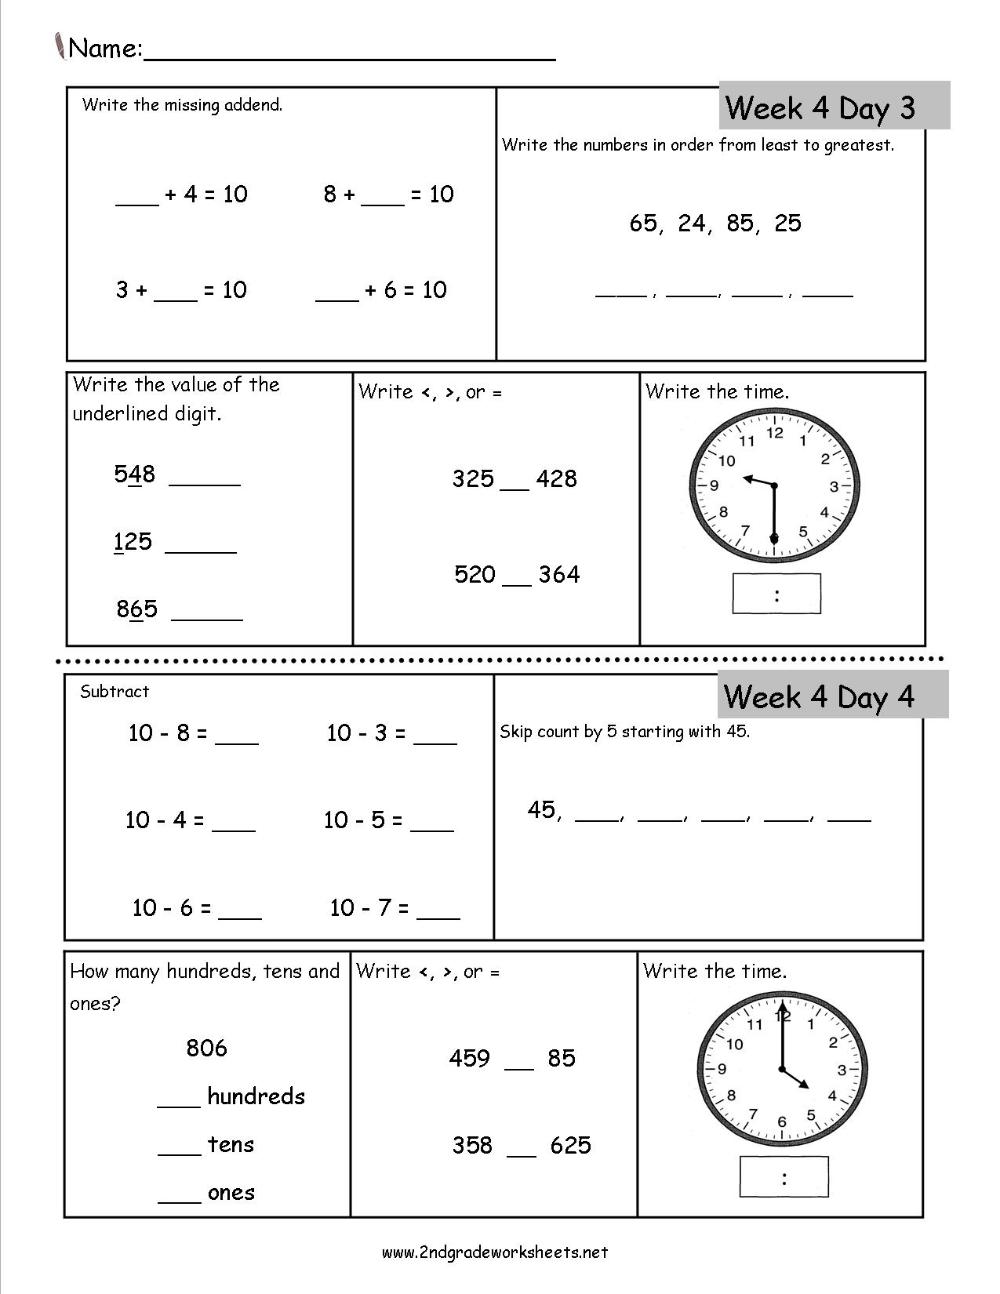 2nd Grade Addition Worksheets For Download Free Math Worksheet For Kids 2nd Grade Math Worksheets Math Practice Worksheets Math Review Worksheets [ 1294 x 1000 Pixel ]